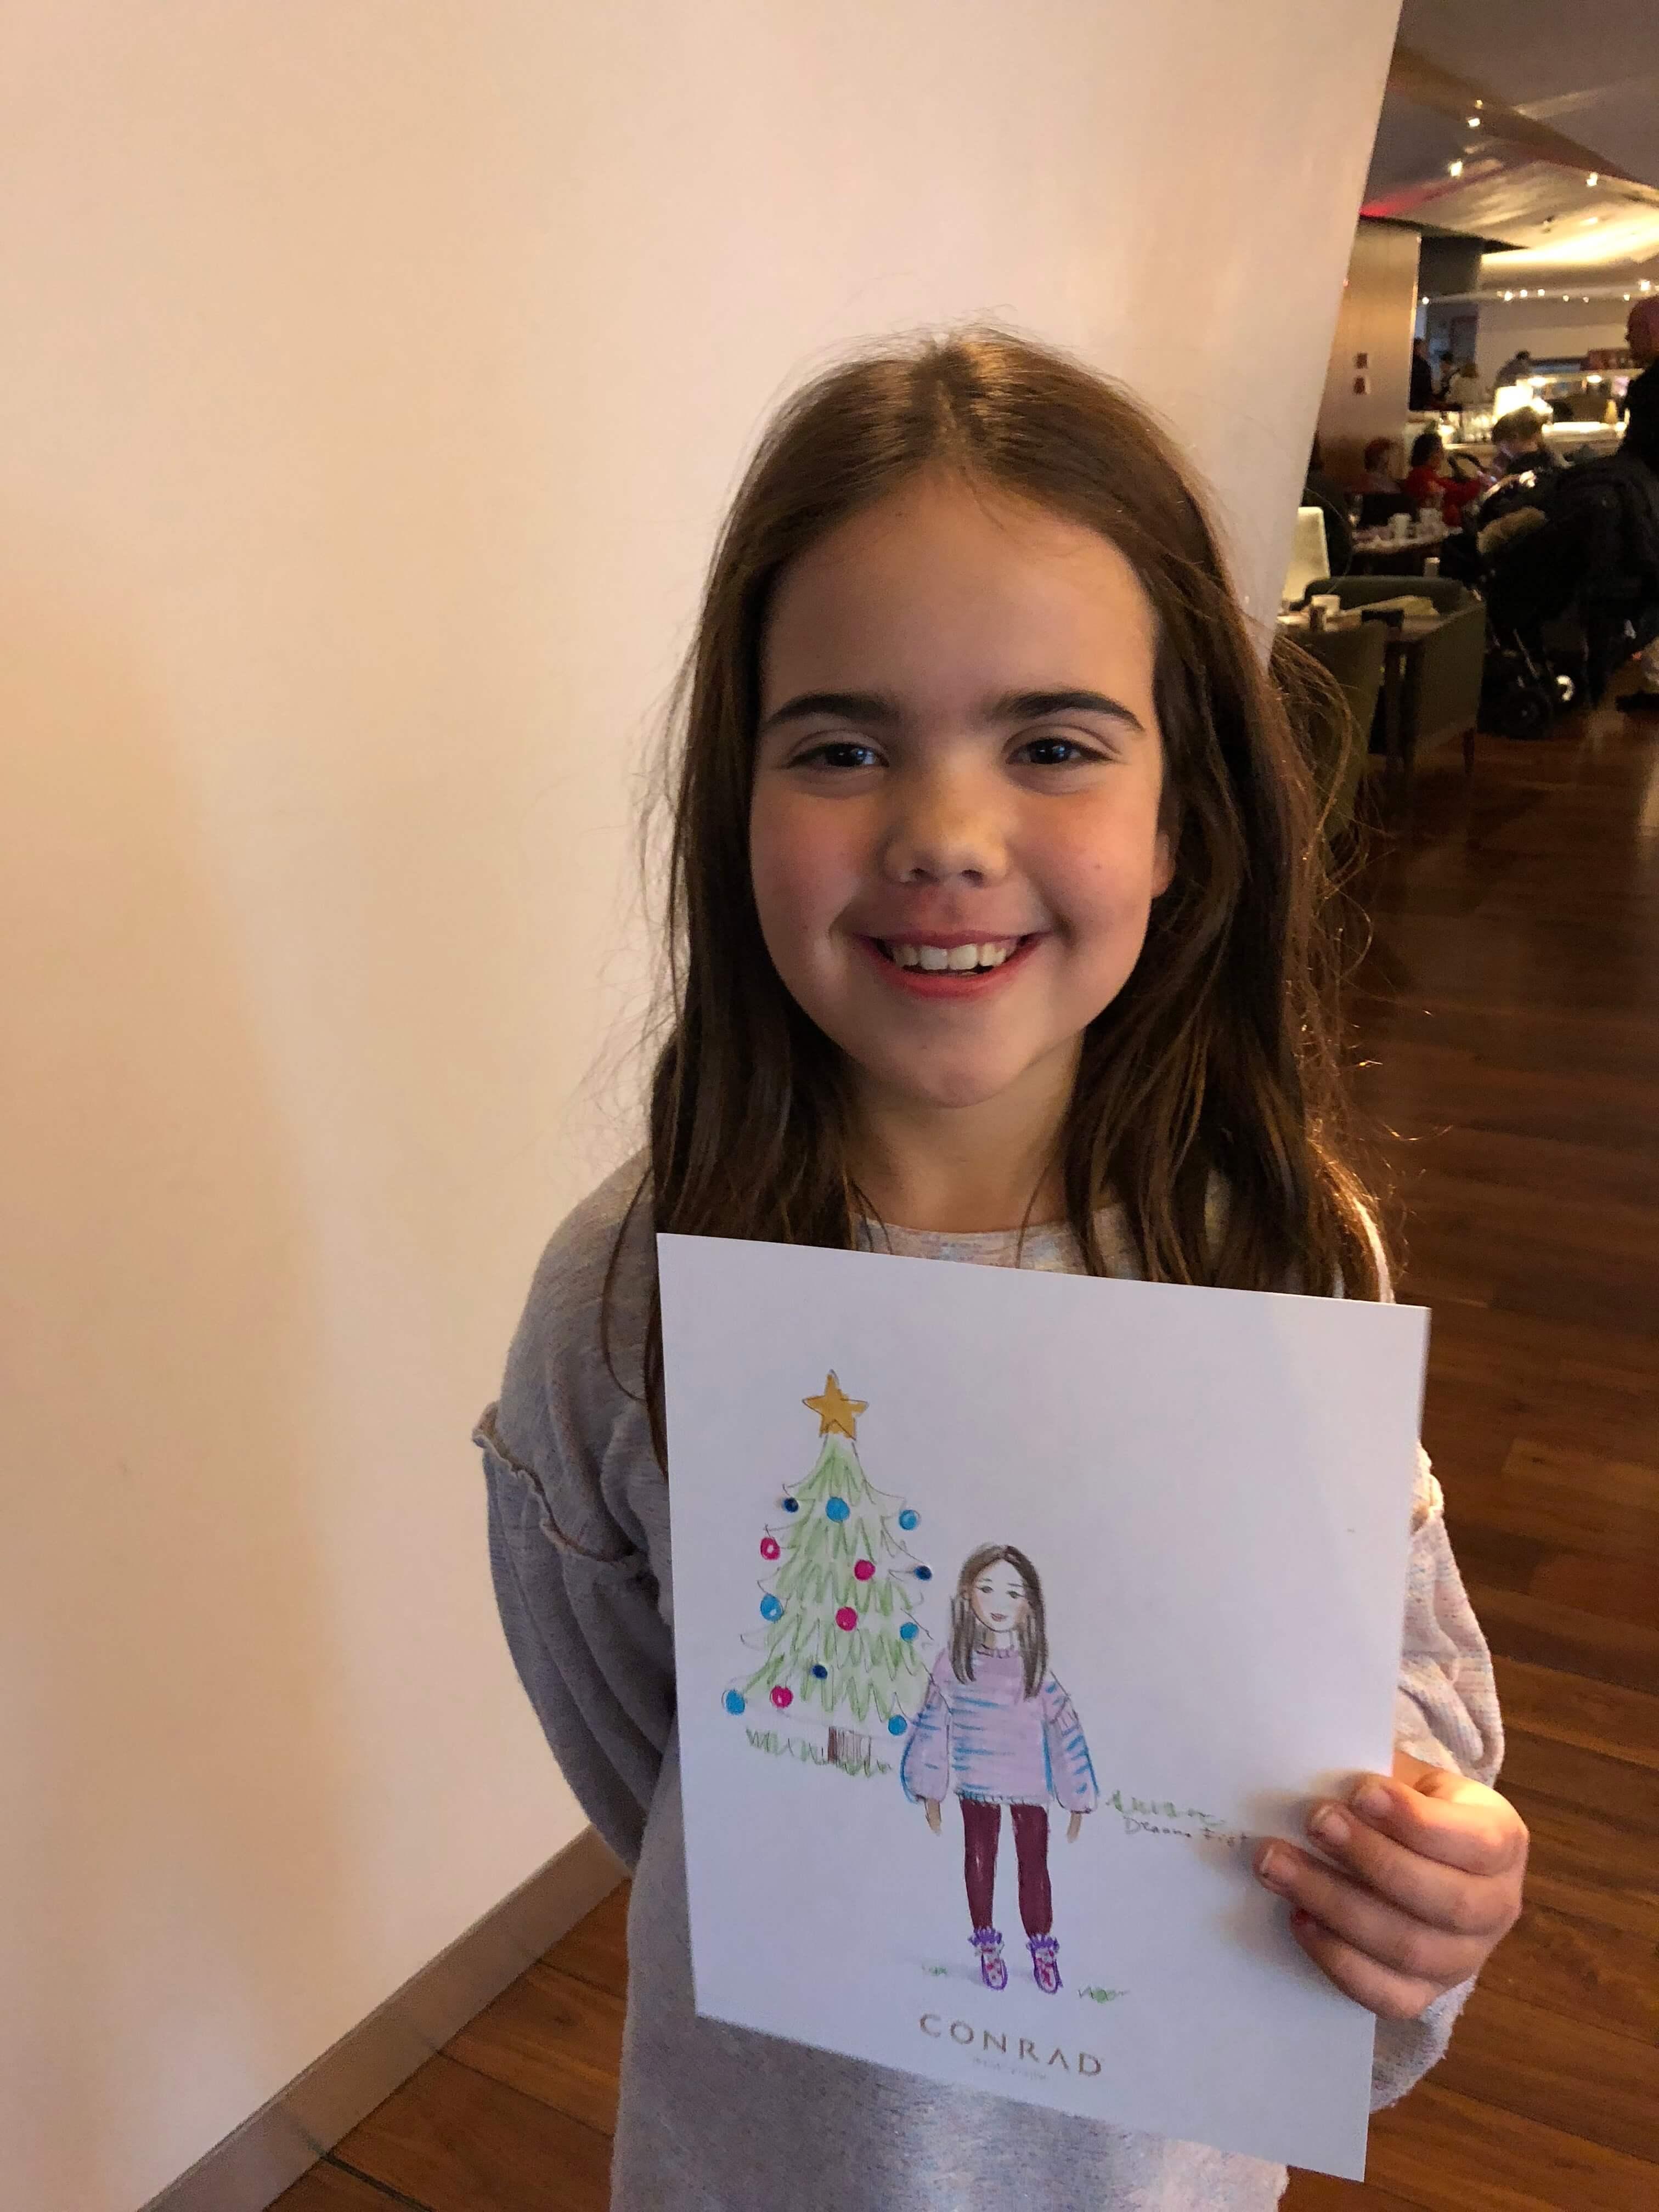 custom illustrations and holiday fun at the conrad new york